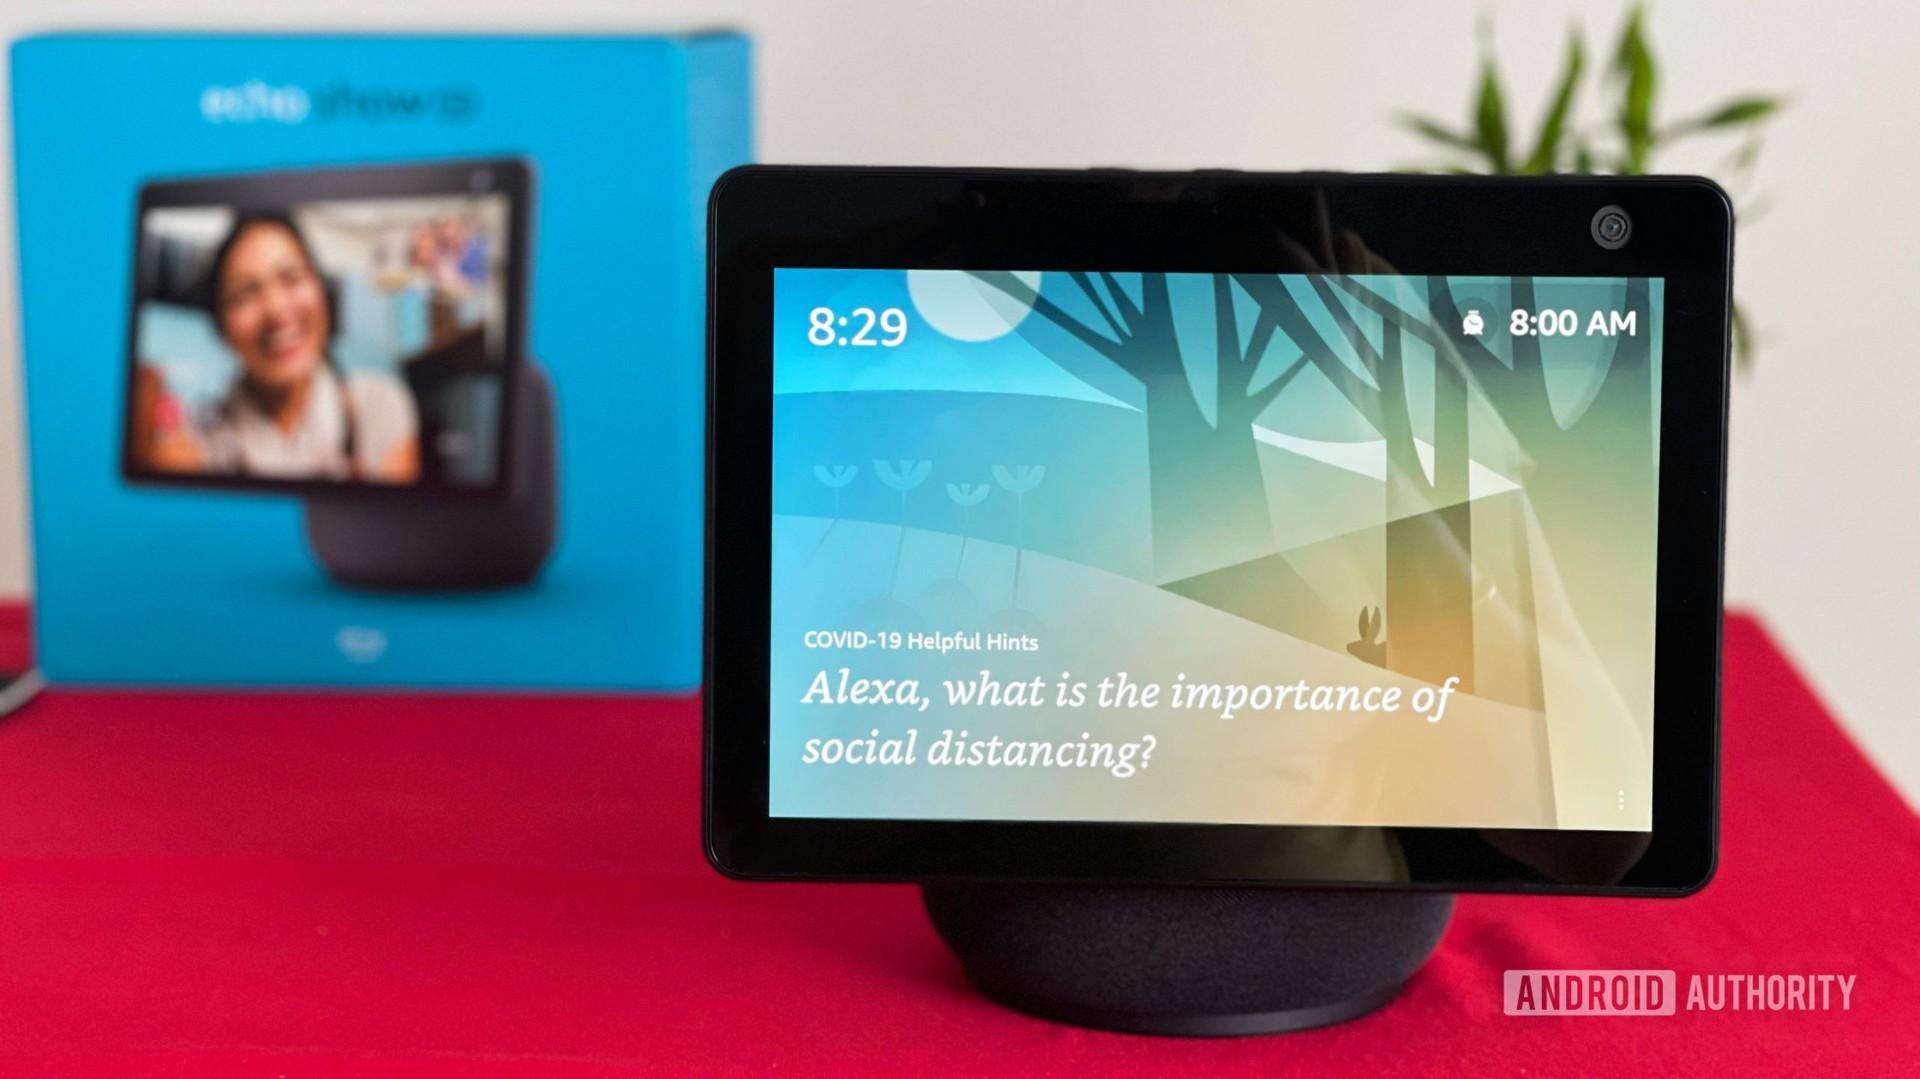 Amazon Echo Show 10 with Alexa on screen